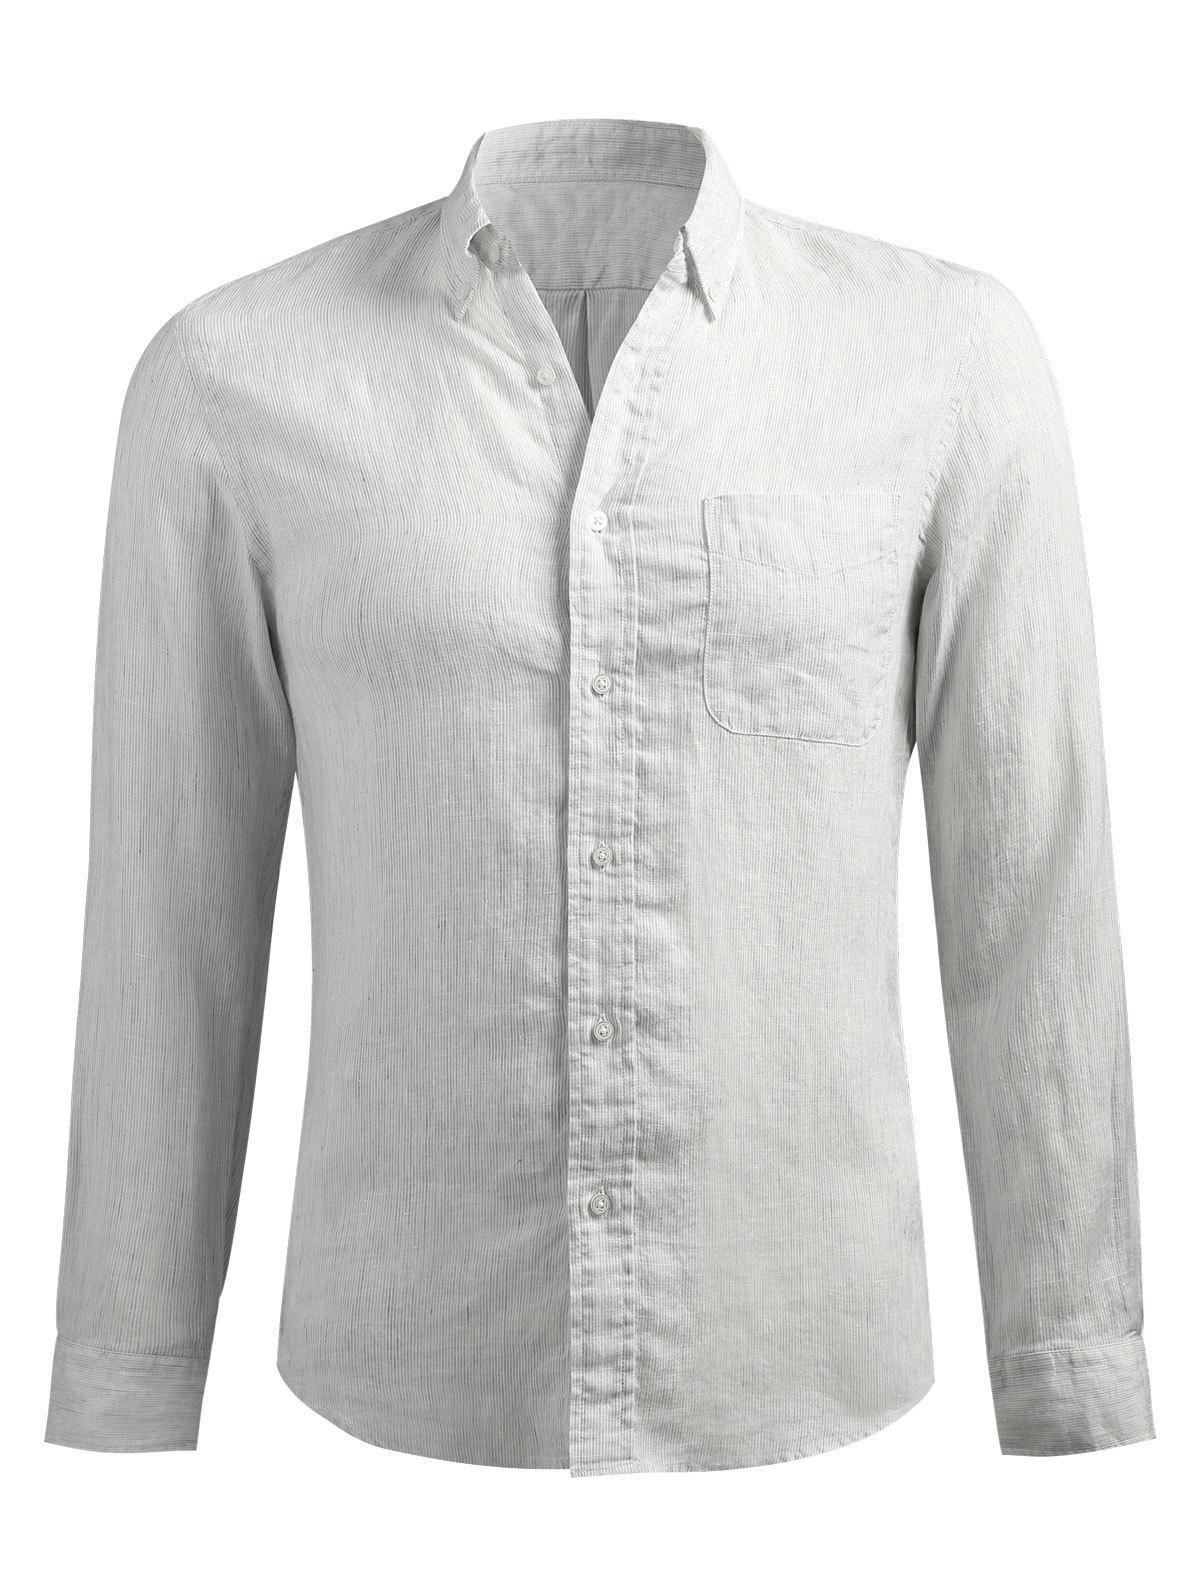 Long Sleeve Slender Stripe Shirt, Platinum